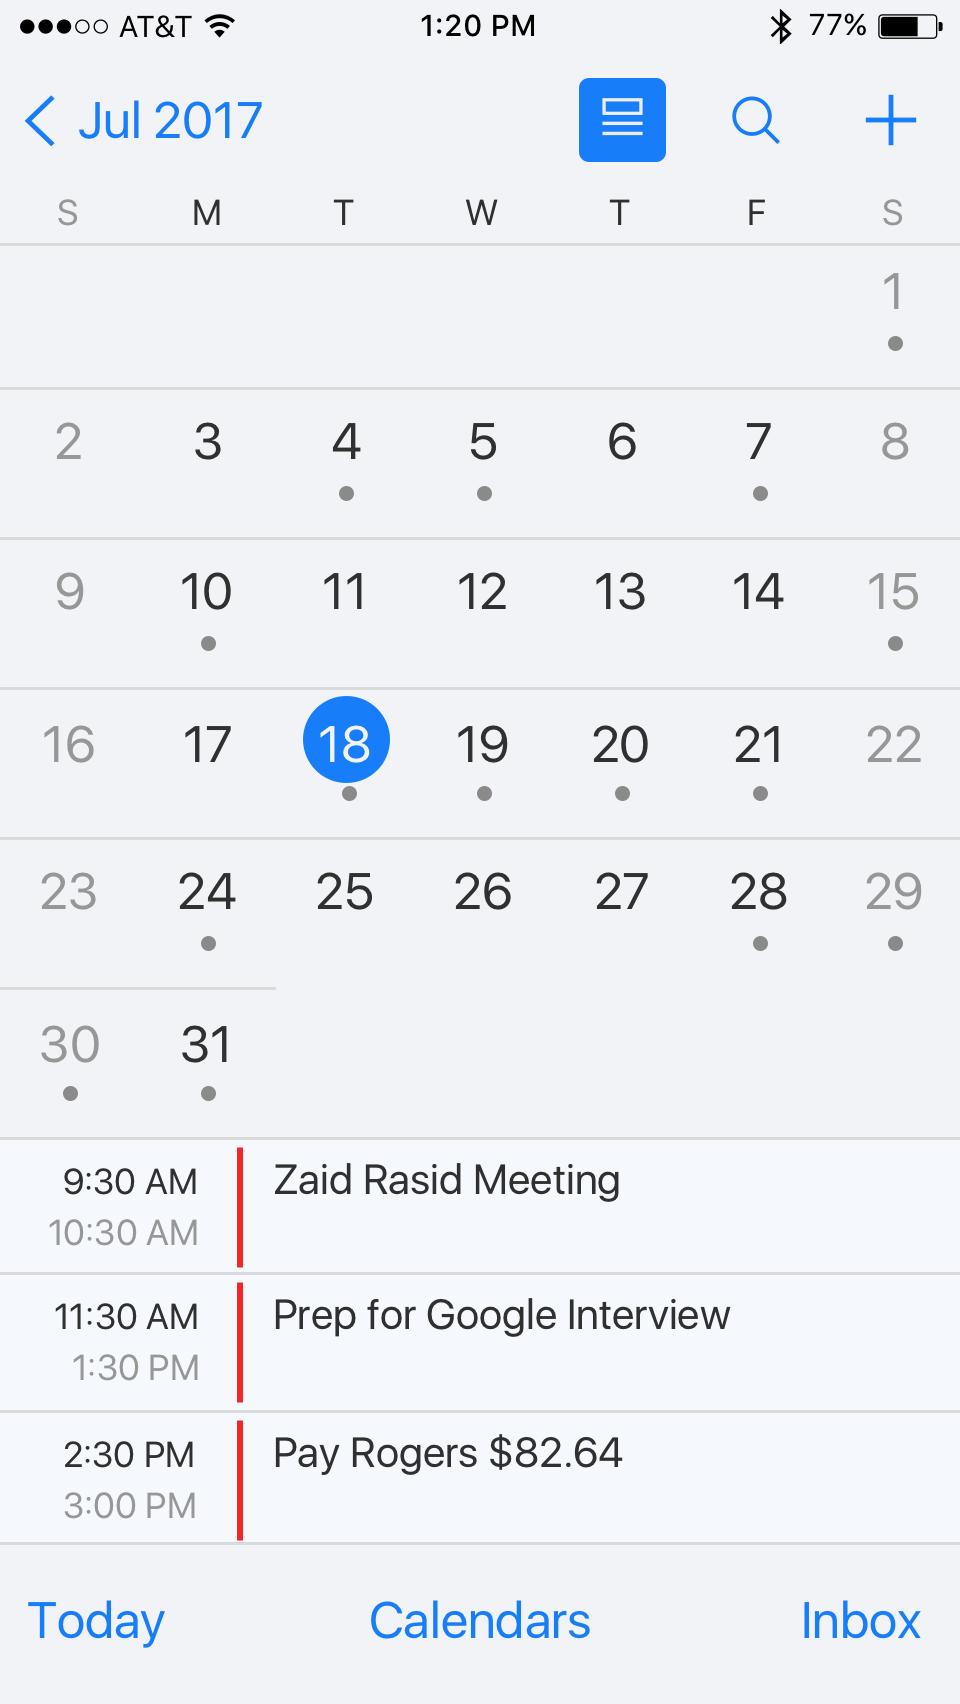 DUI_038_calendar_colored.png